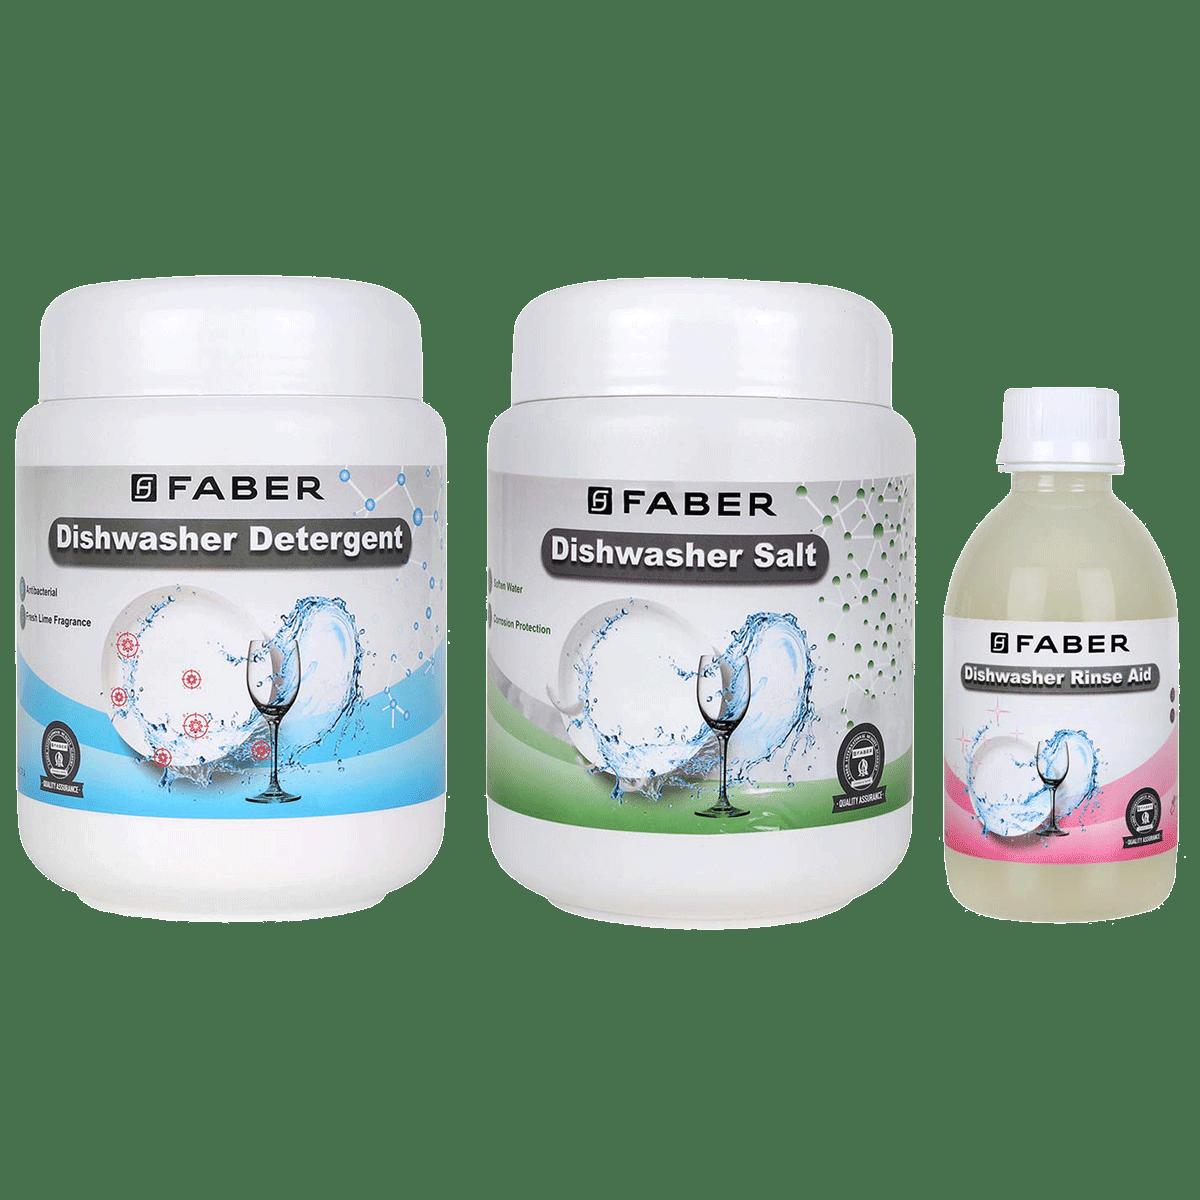 Faber Detergent Kit For Dishwasher (Shining Clean Utensils, 112.0630.660, White)